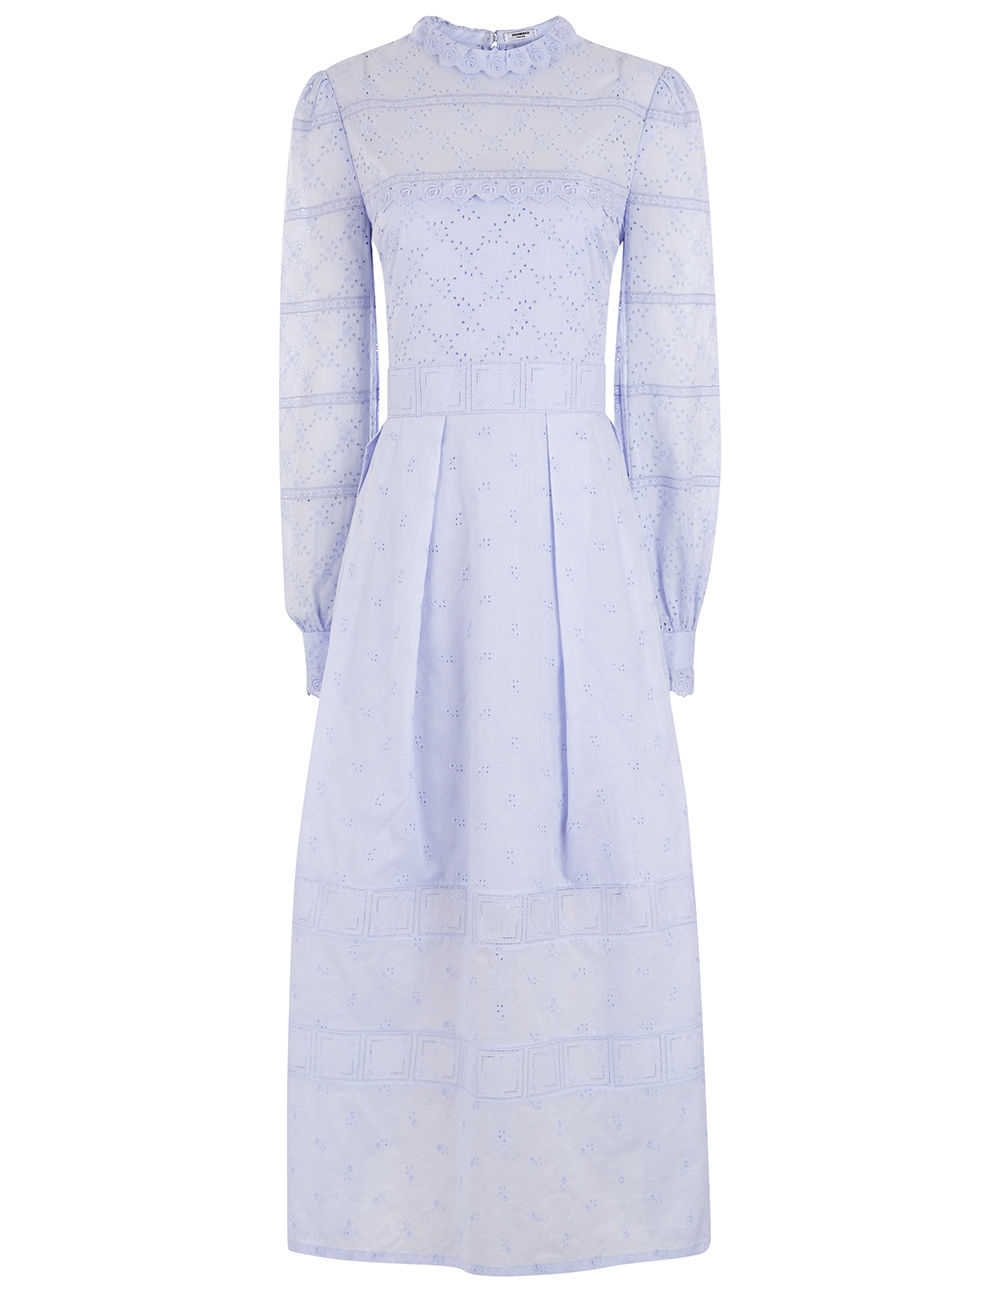 vilshenko-purple-lavender-cotton-pru-midi-dress-product-4-656540650-normal.jpg